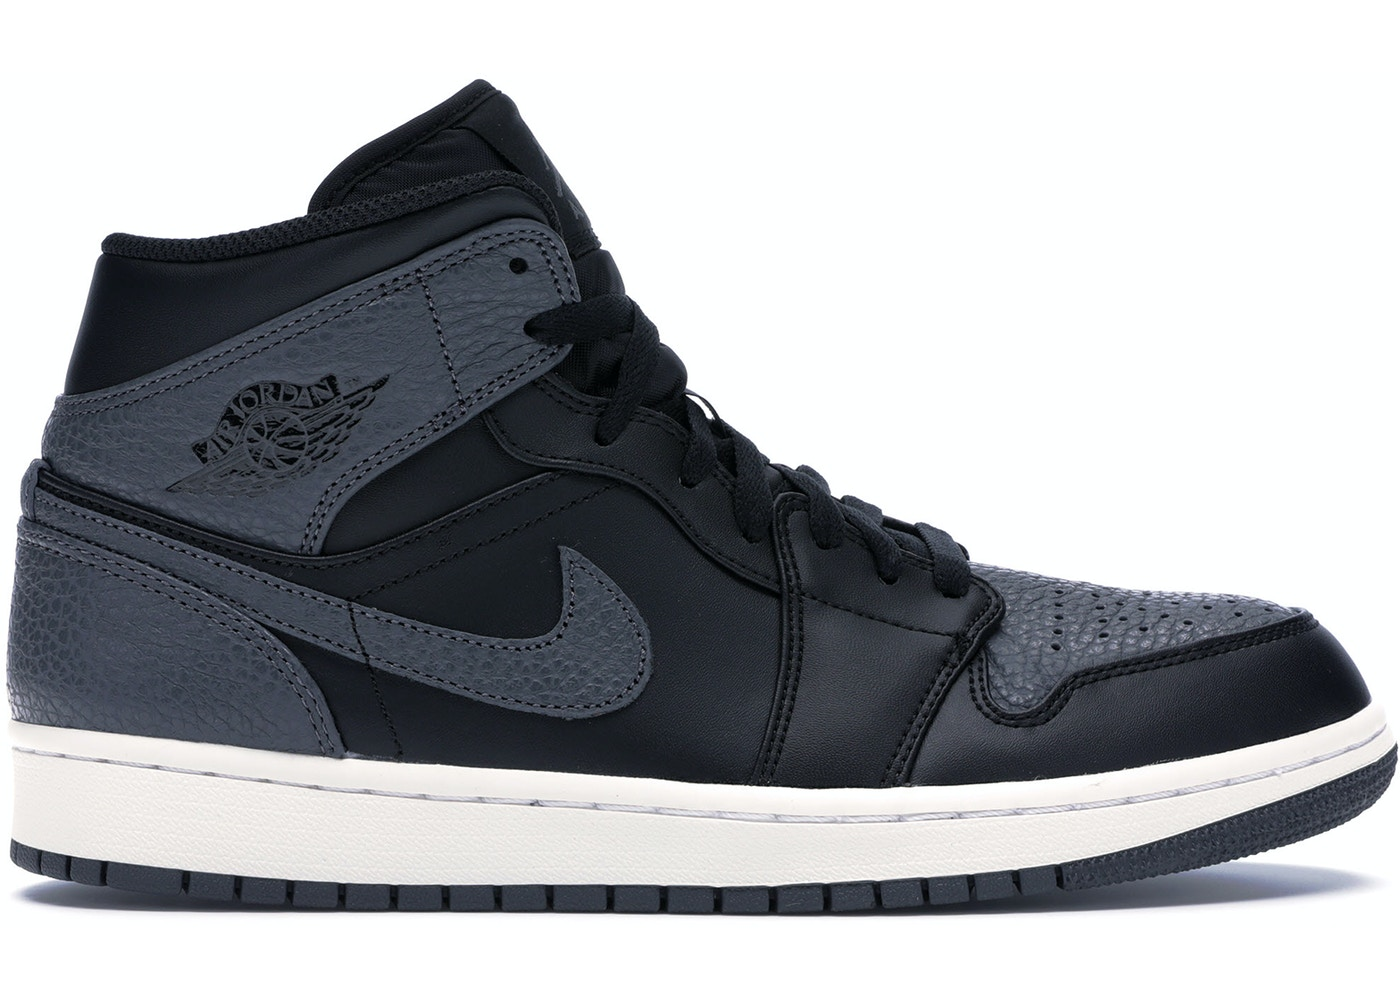 Jordan 1 Retro Mid Black Dark Grey - 554724-041 6af4ed3b36d5